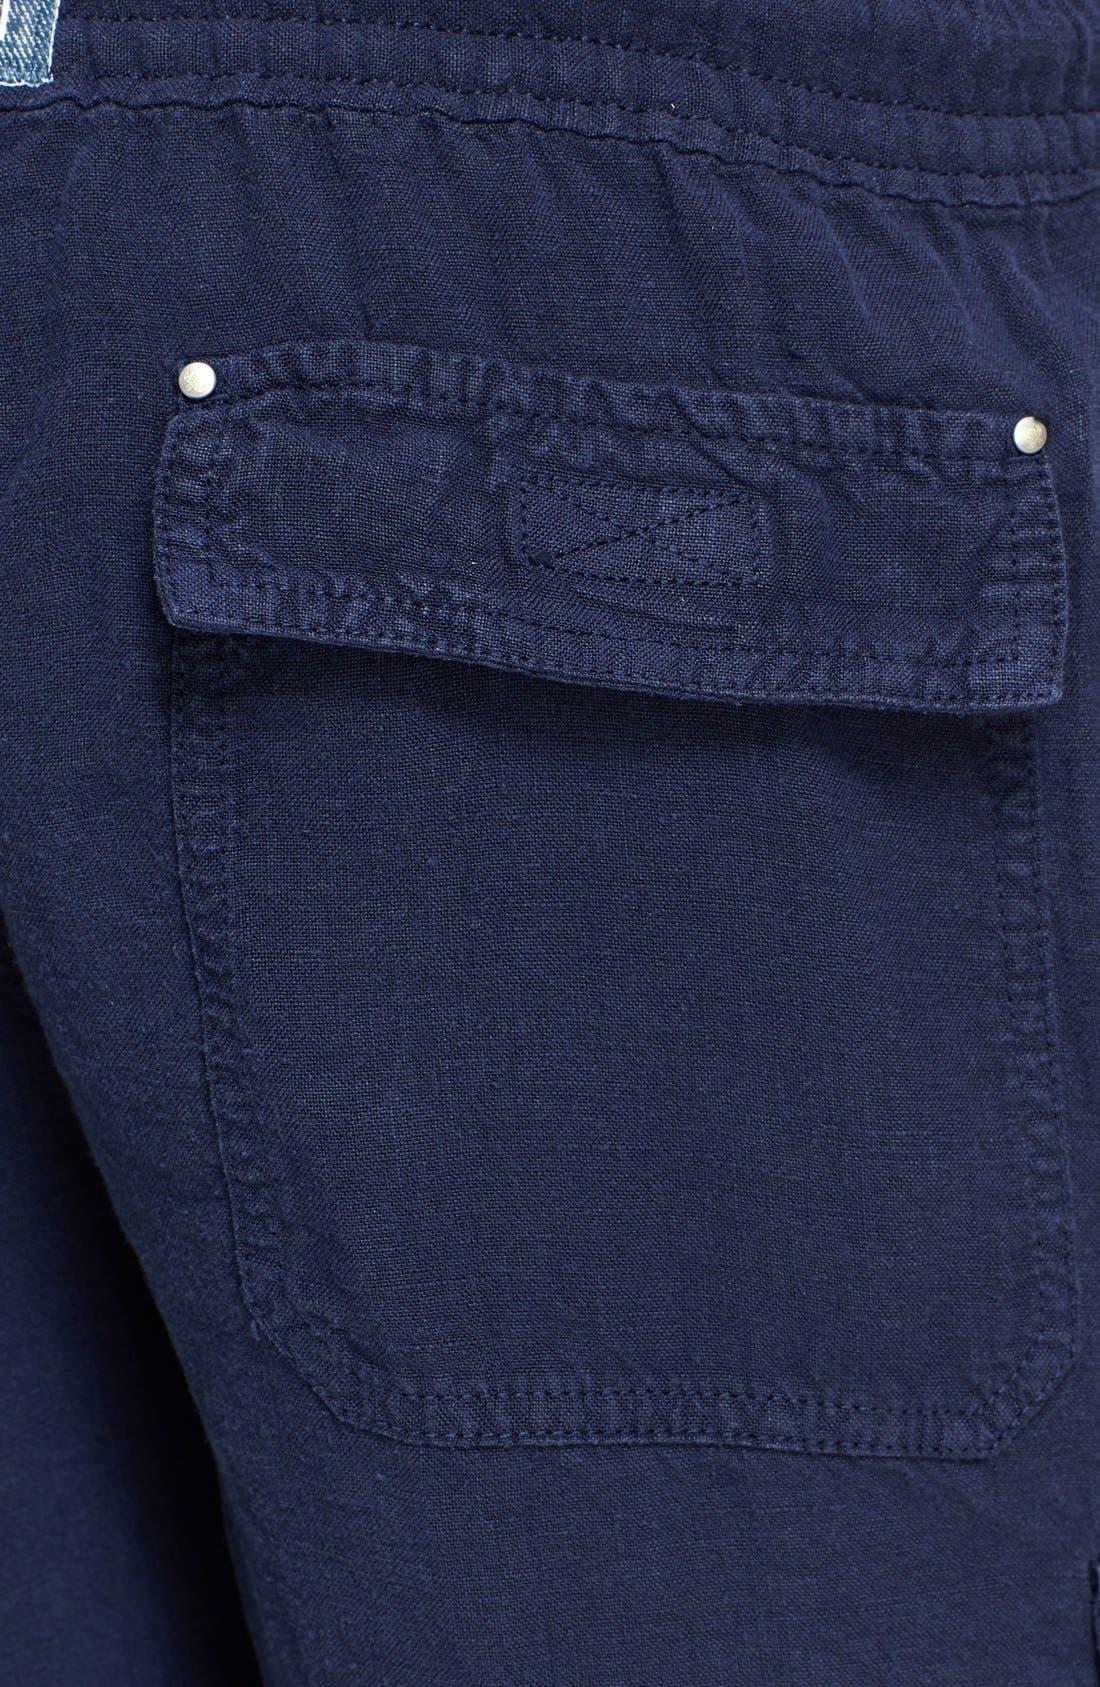 Alternate Image 3  - Vilebrequin 'Baie' Linen Cargo Shorts